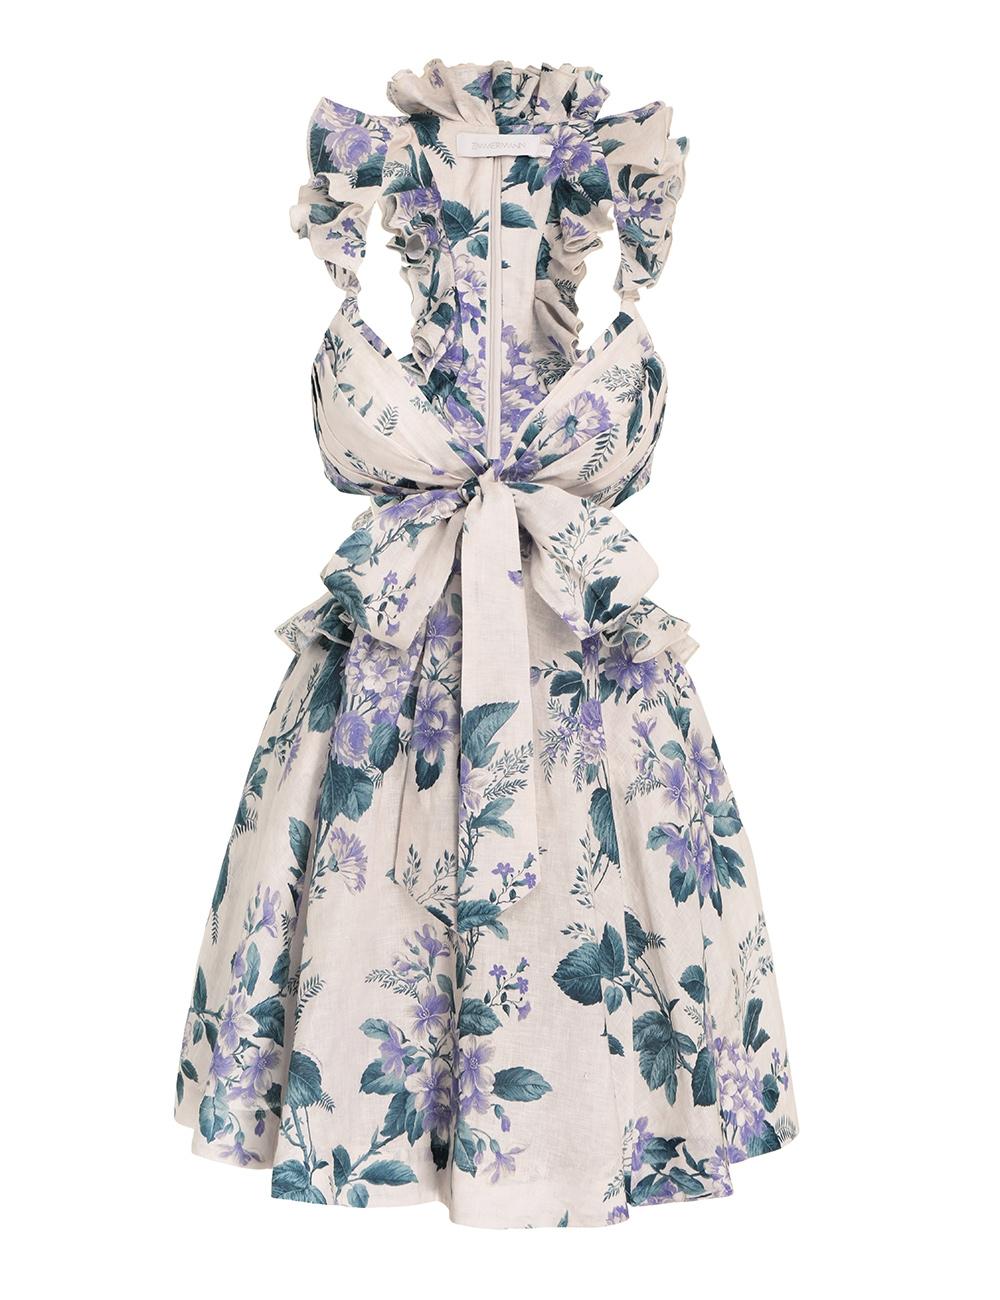 Cassia Ruffle Mini Dress